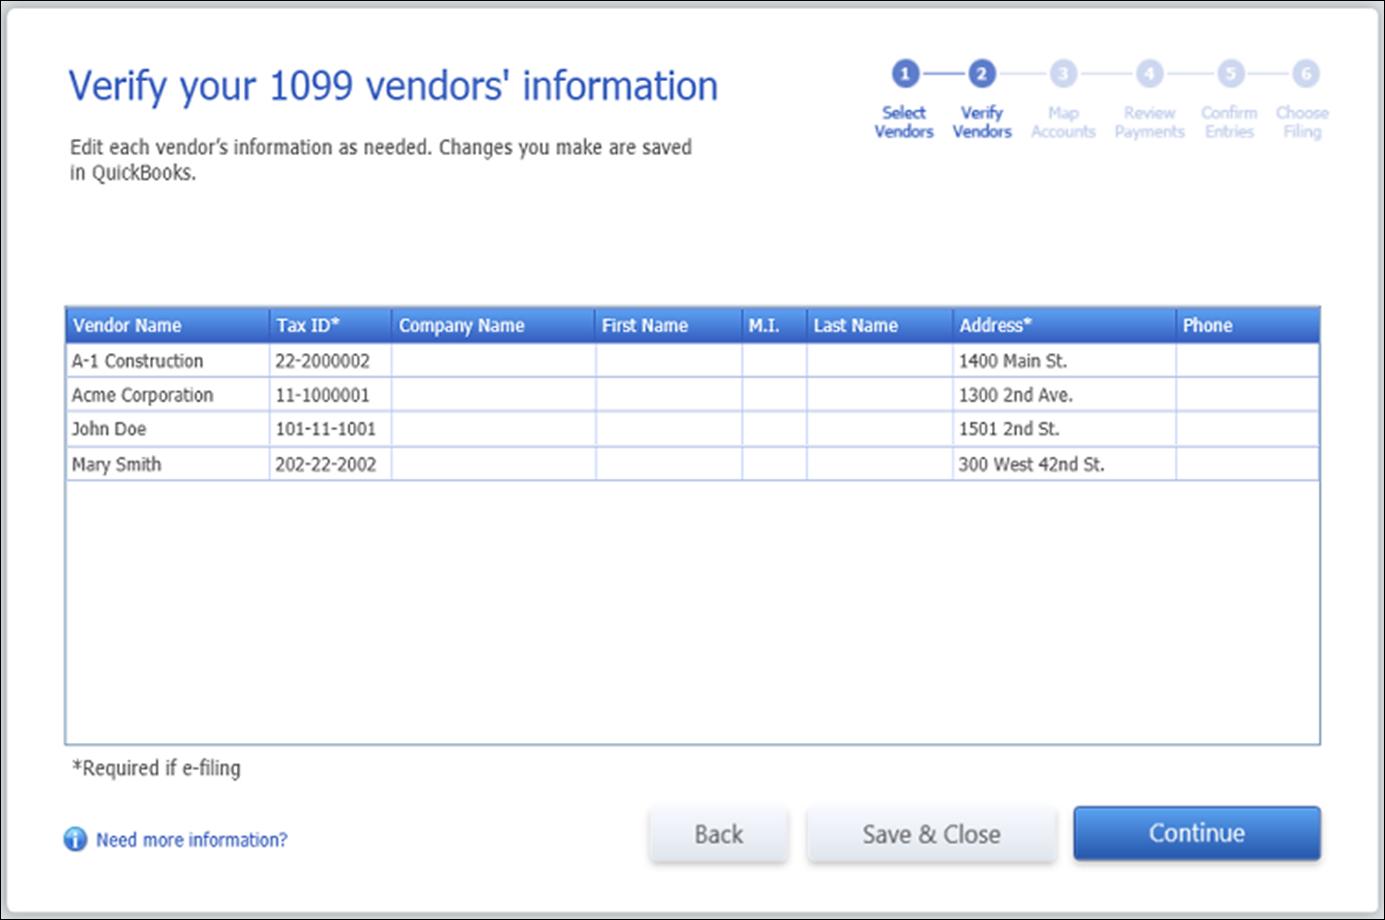 QuickBooks 1099 Wizard